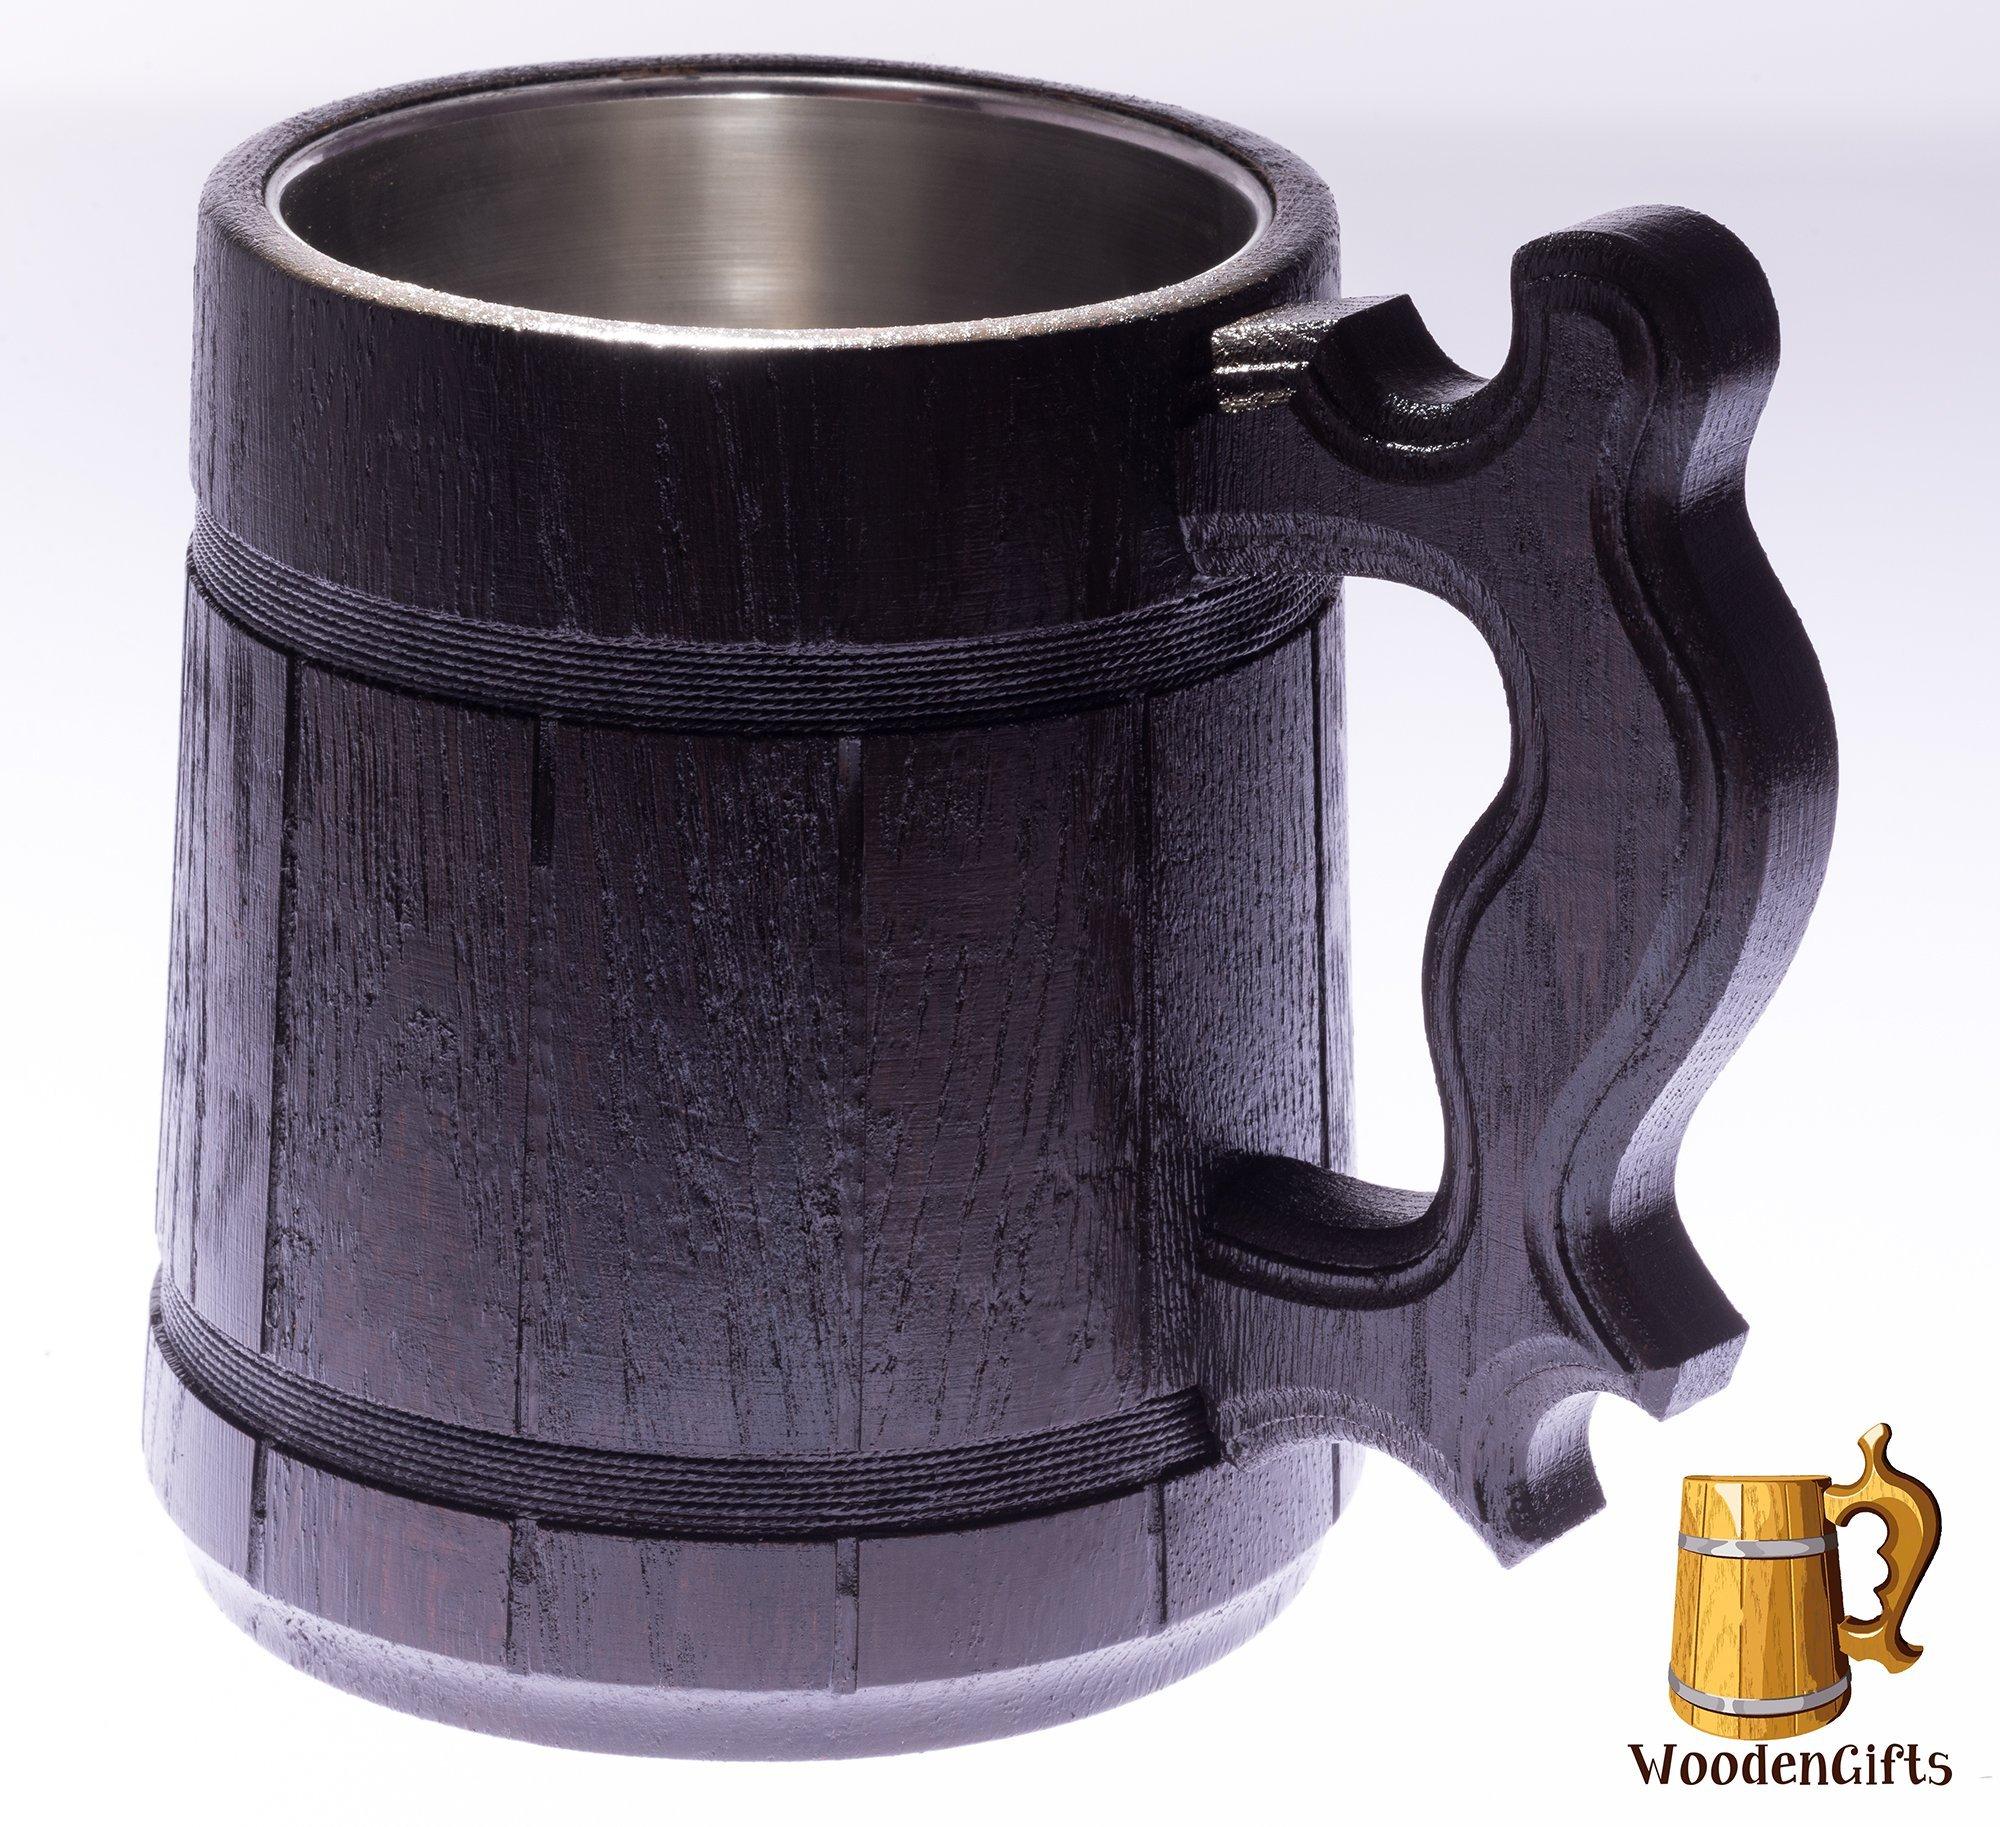 Beer Mug/Wooden Beer Mug/Tankard / Wood Mug By WoodenGifts - 0.6 Litres Or 20oz Wooden Mug - Wooden Coffee Mug with Stainless Steel Cup Inside